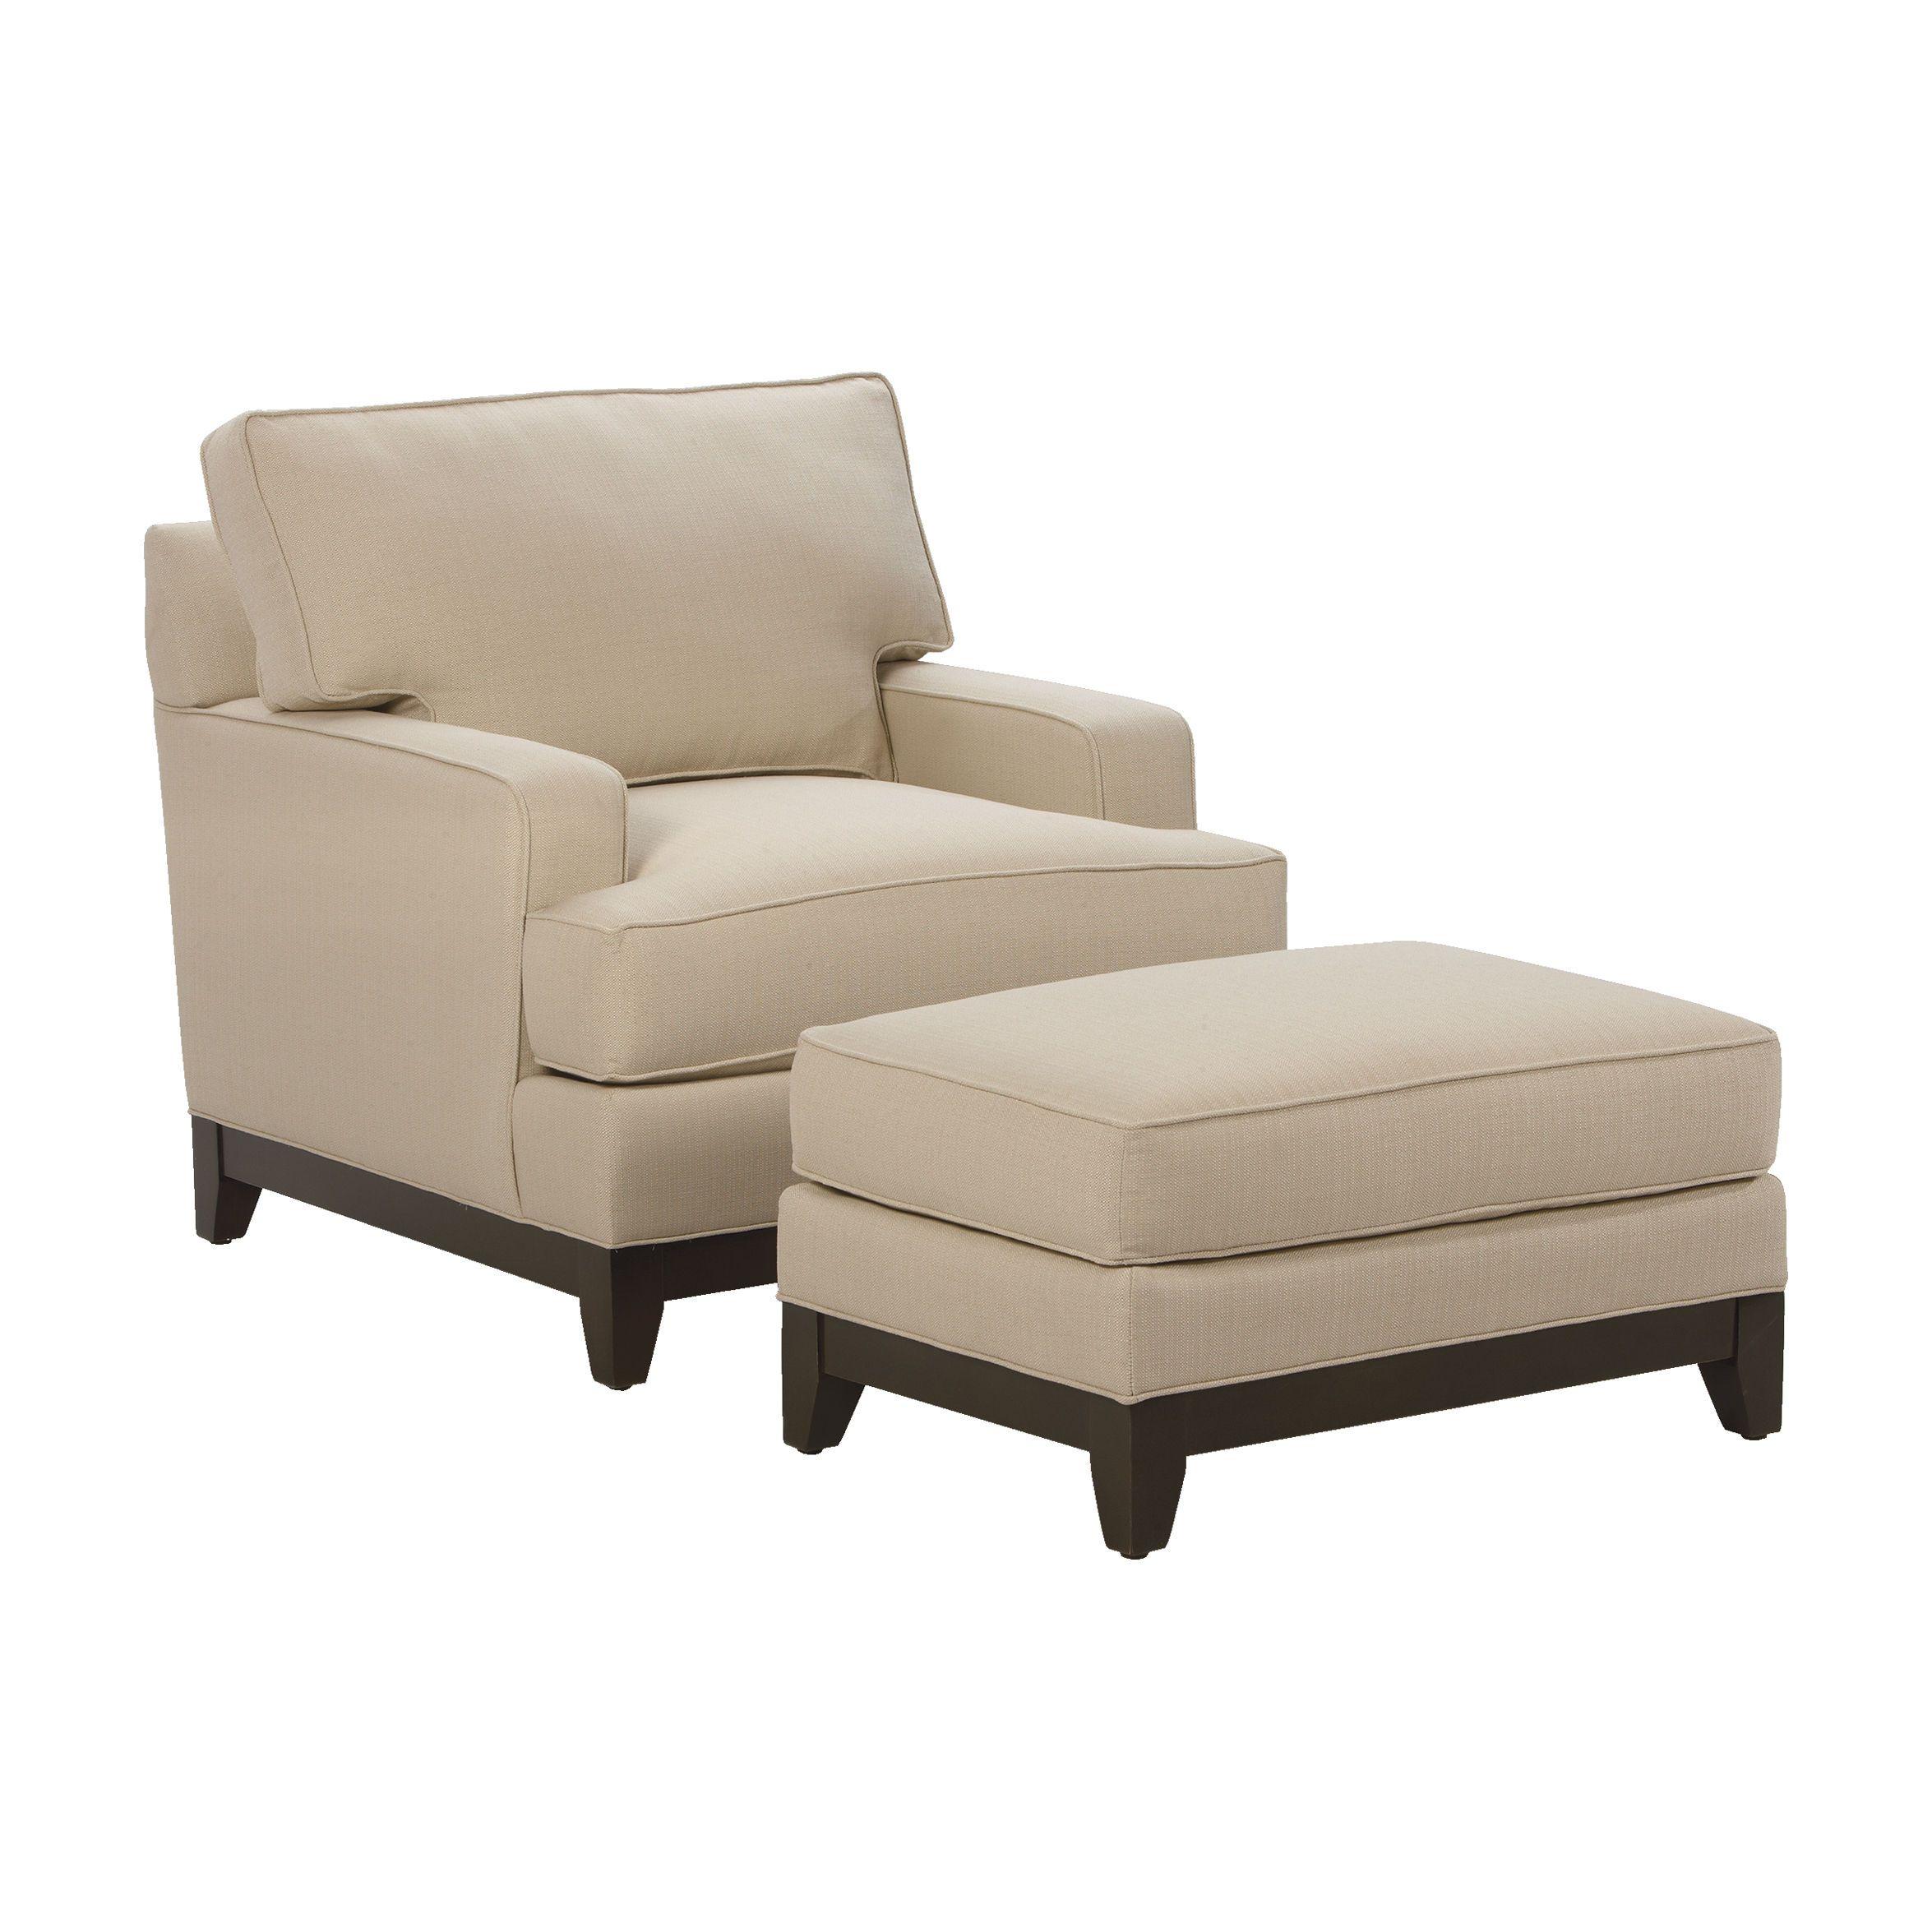 Arcata Chair, Cayman/ Bone - Ethan Allen US   Curtis Lookbook ...